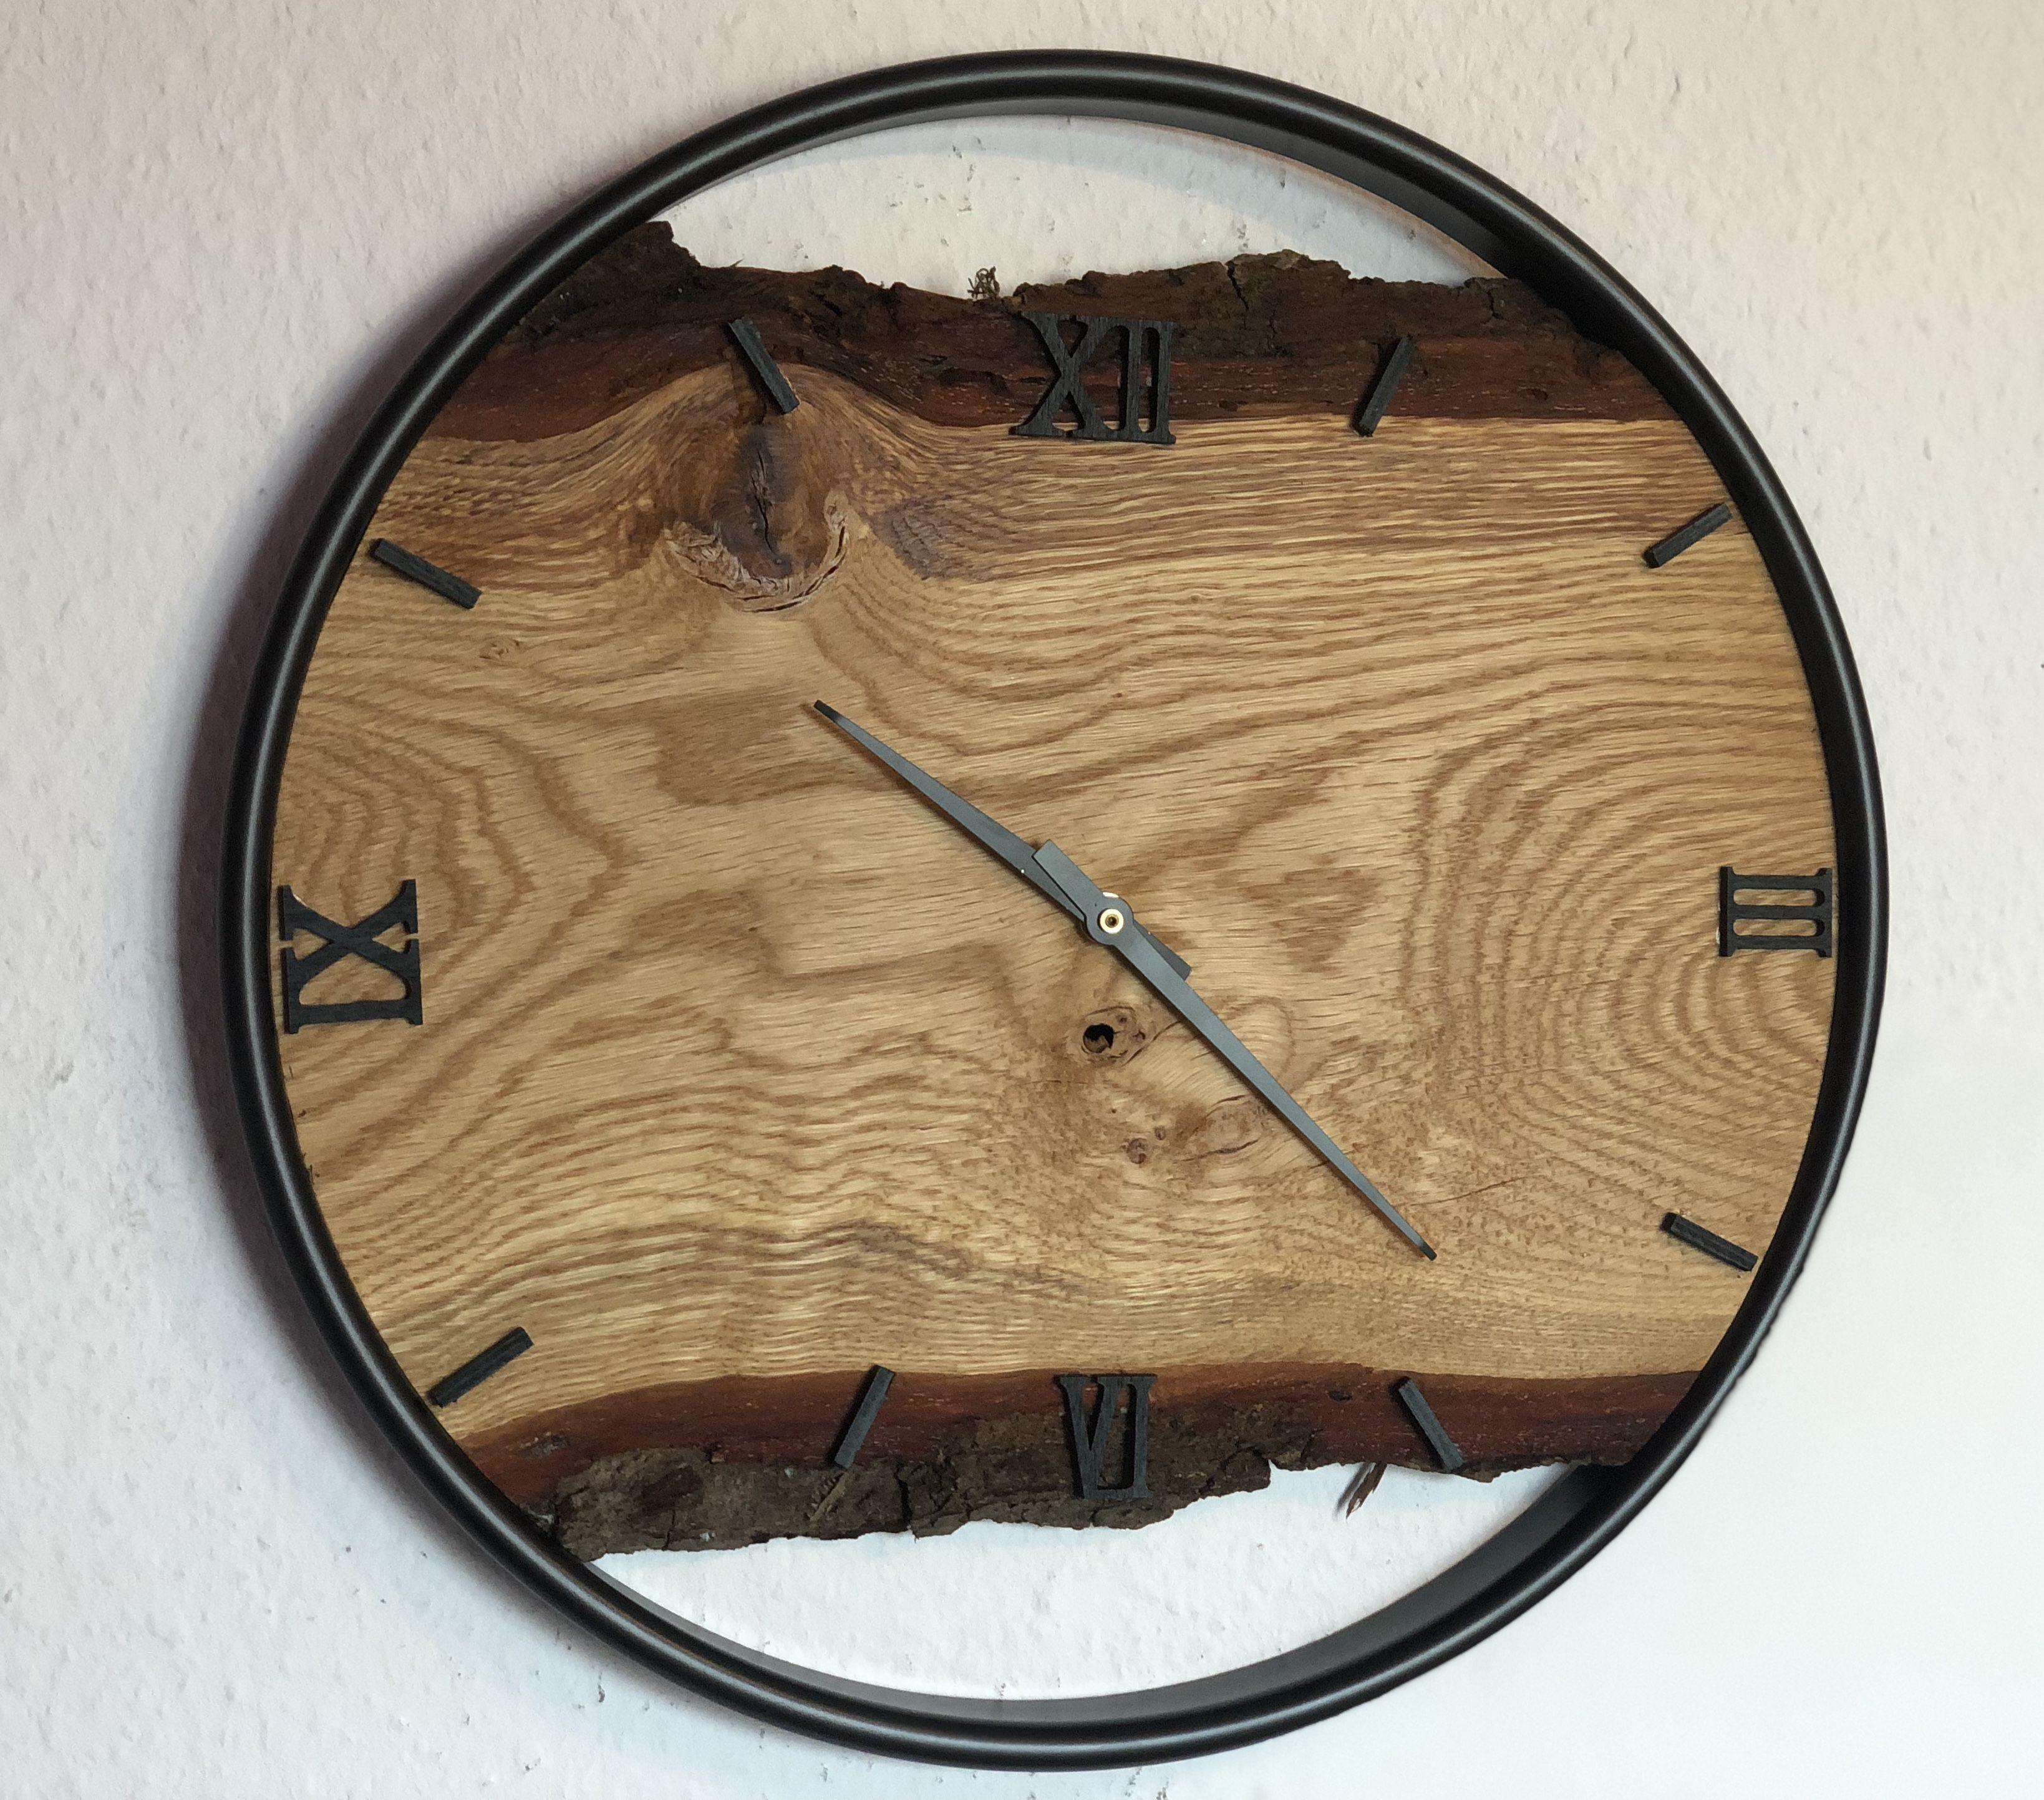 Klan Holzdesign Wanduhren Wanduhren Uhr Holz Wanduhr Holz